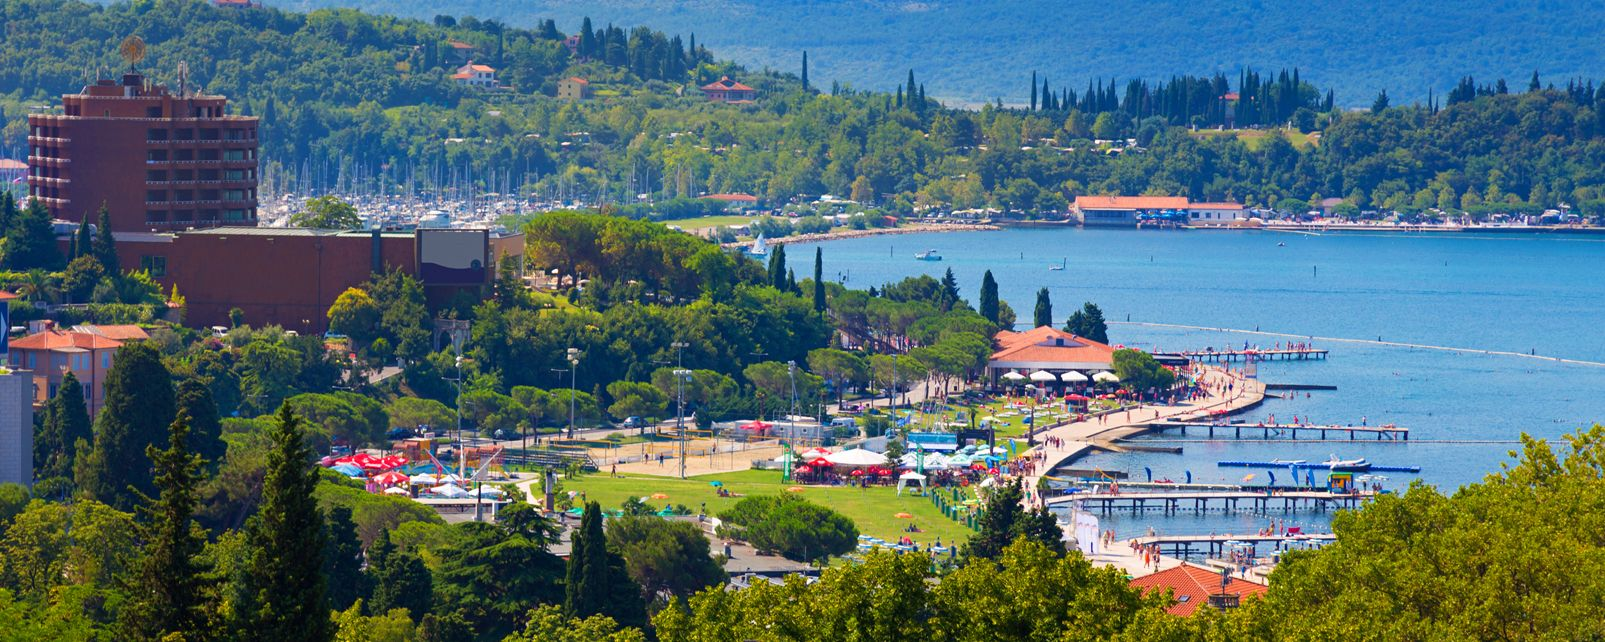 Portoroz , Vue panoramique sur Portoro?, Slovénie , Slovénie